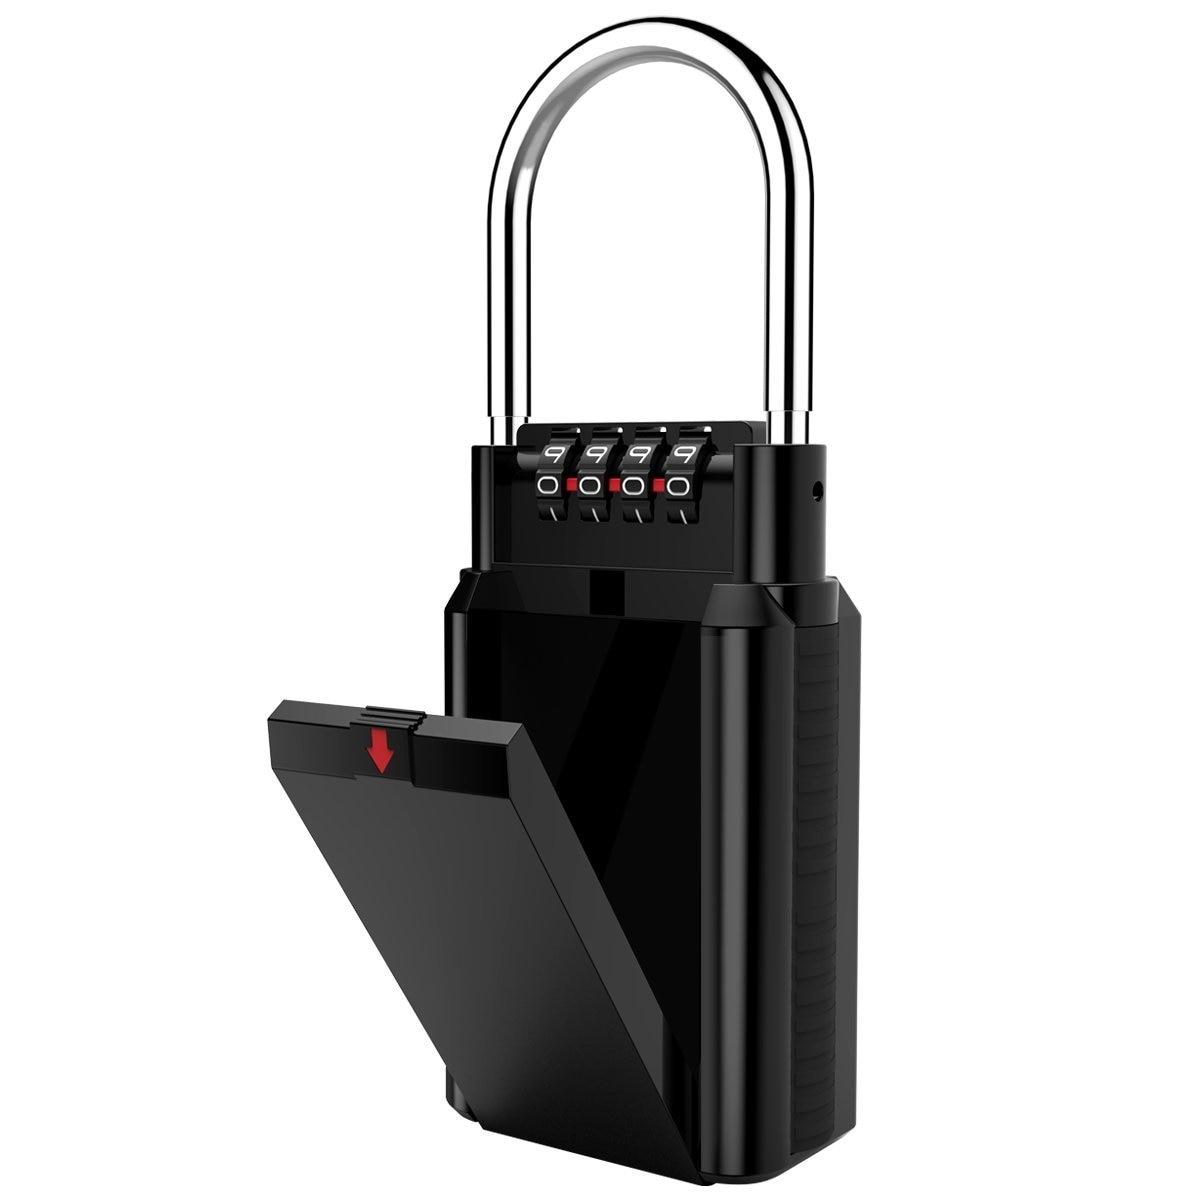 MOOL Combination Lock Box Key Storage Lock Box 4-Digit Combination Lock Waterproof Indoor/Outdoor